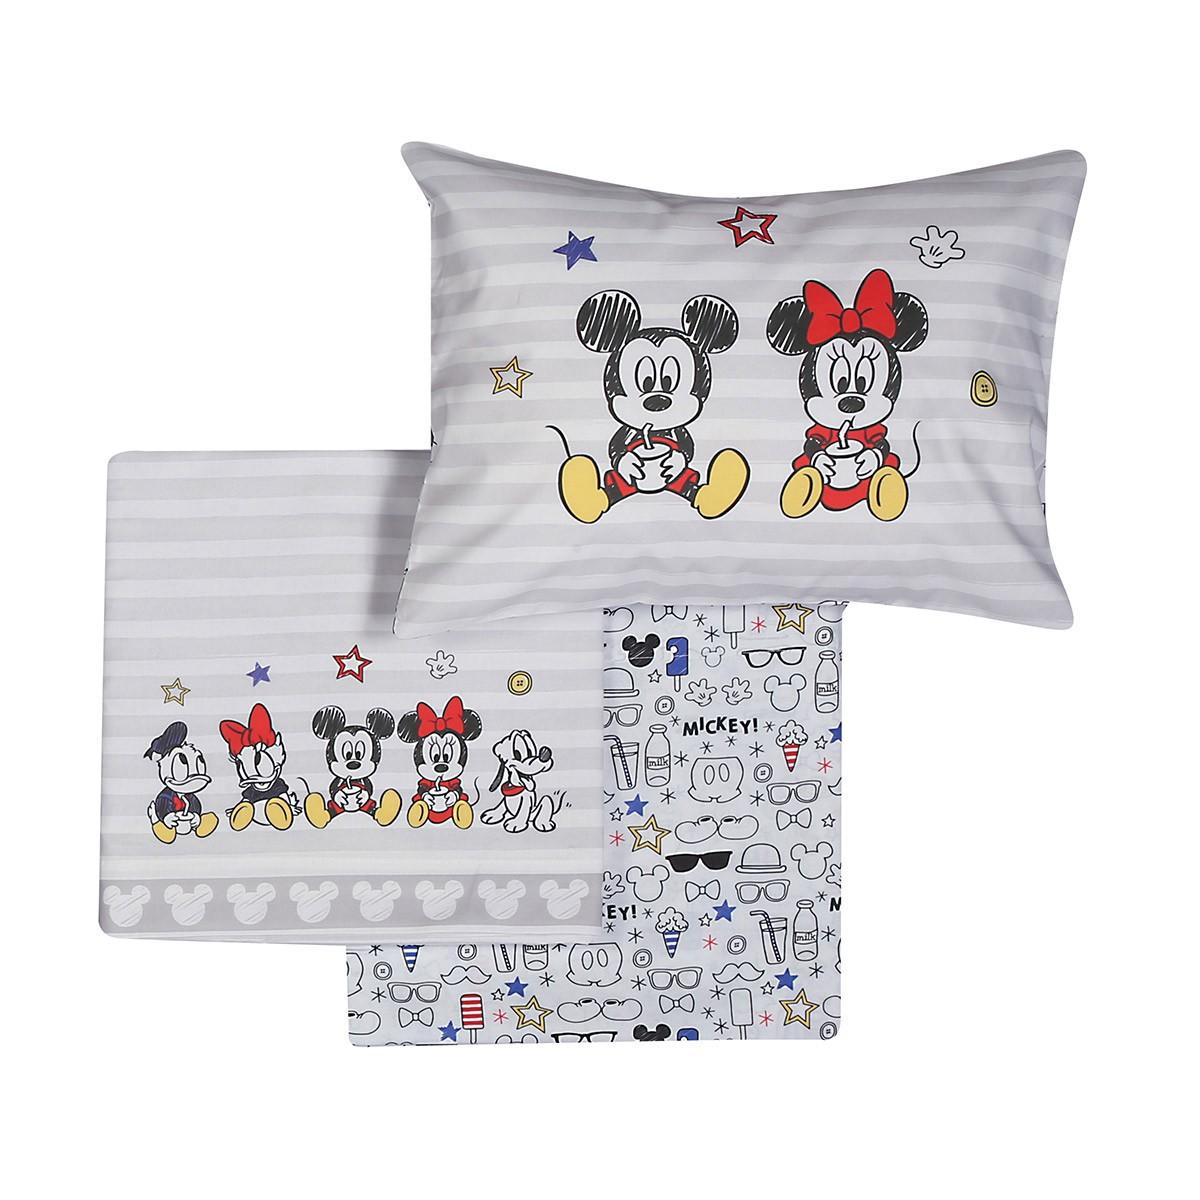 6d1589294aa Σεντόνια Κούνιας (Σετ) Nef-Nef Disney Mickey Best Friends